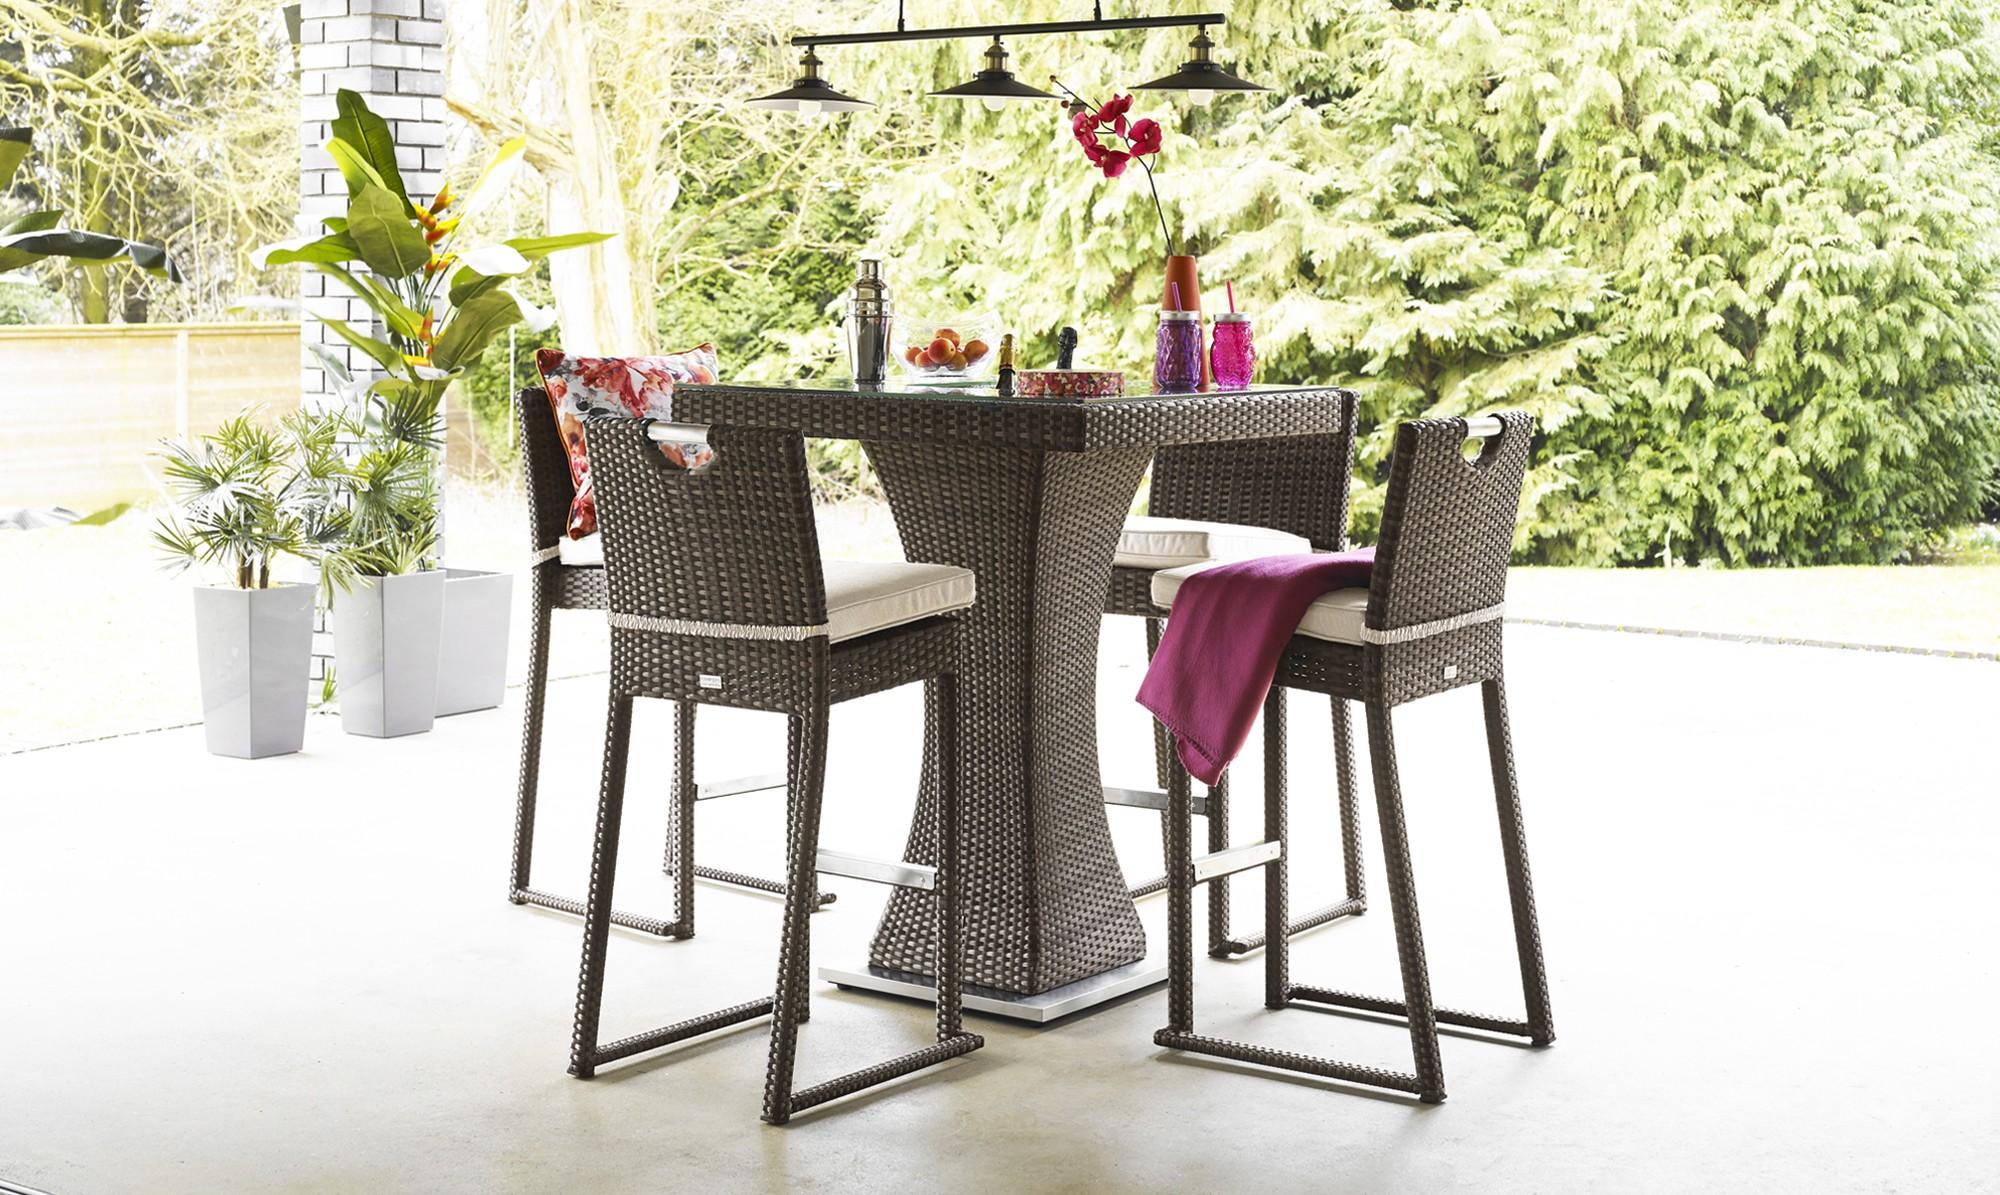 well furnir brown color 4 seat square bar set with ice bucket rattan garden set wellfurnir. Black Bedroom Furniture Sets. Home Design Ideas